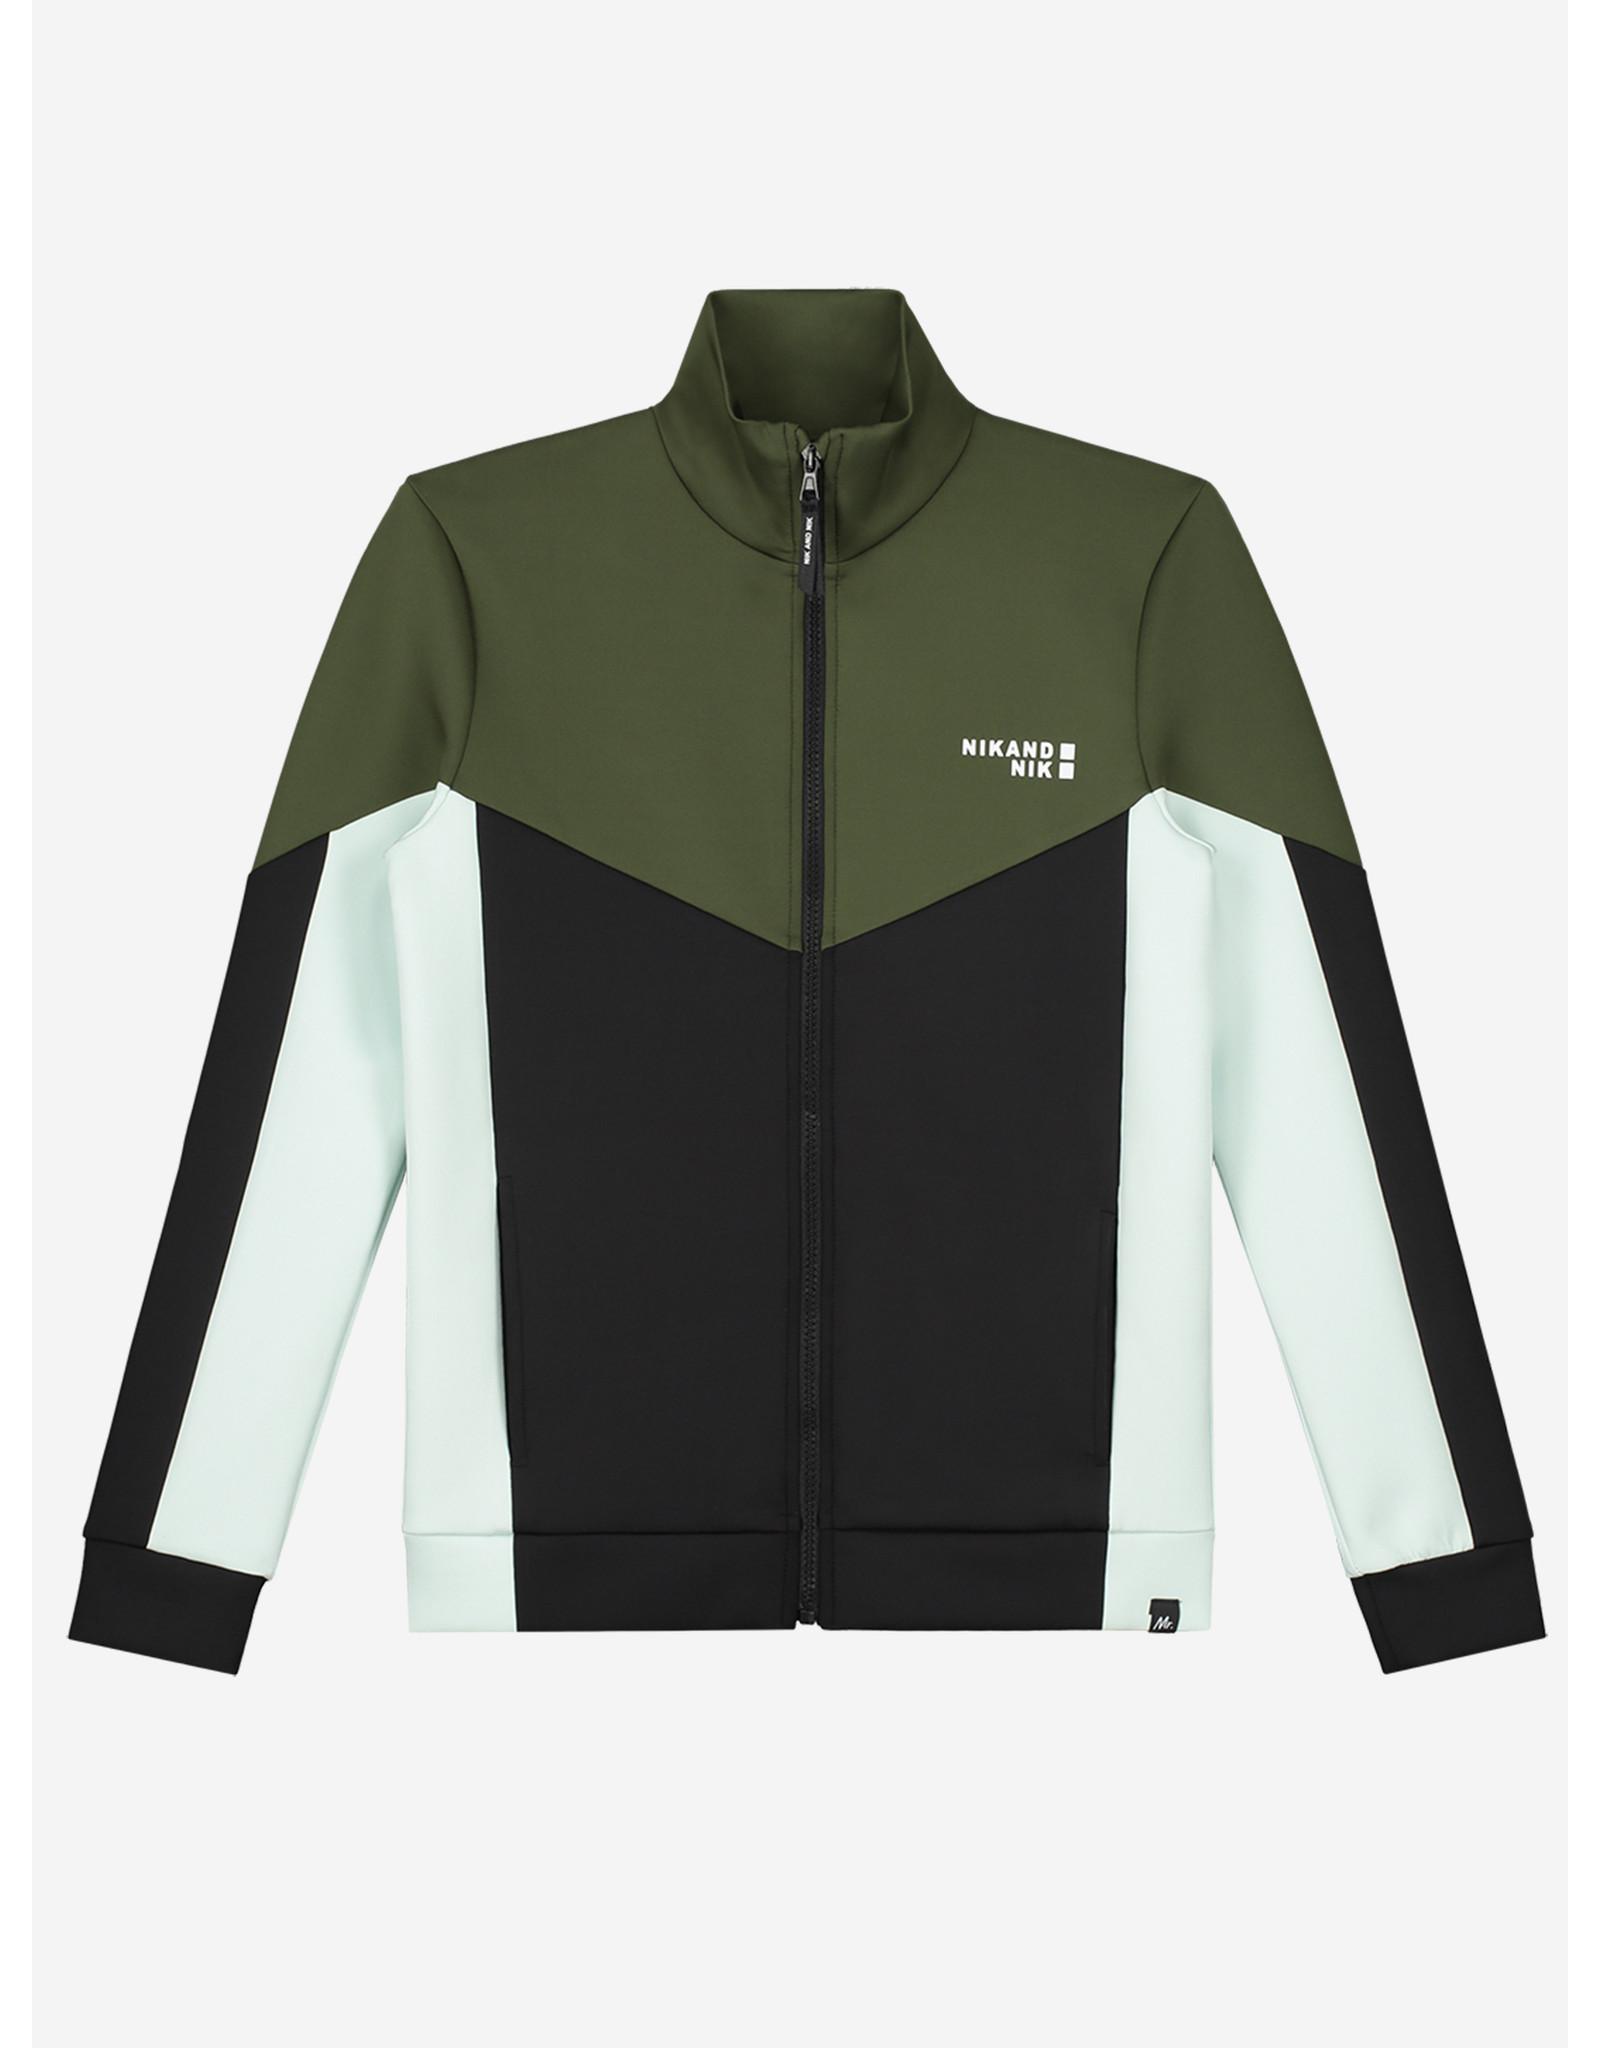 Nik&Nik NIK&NIK Mayron Track Jacket DARK MOSS GREEN